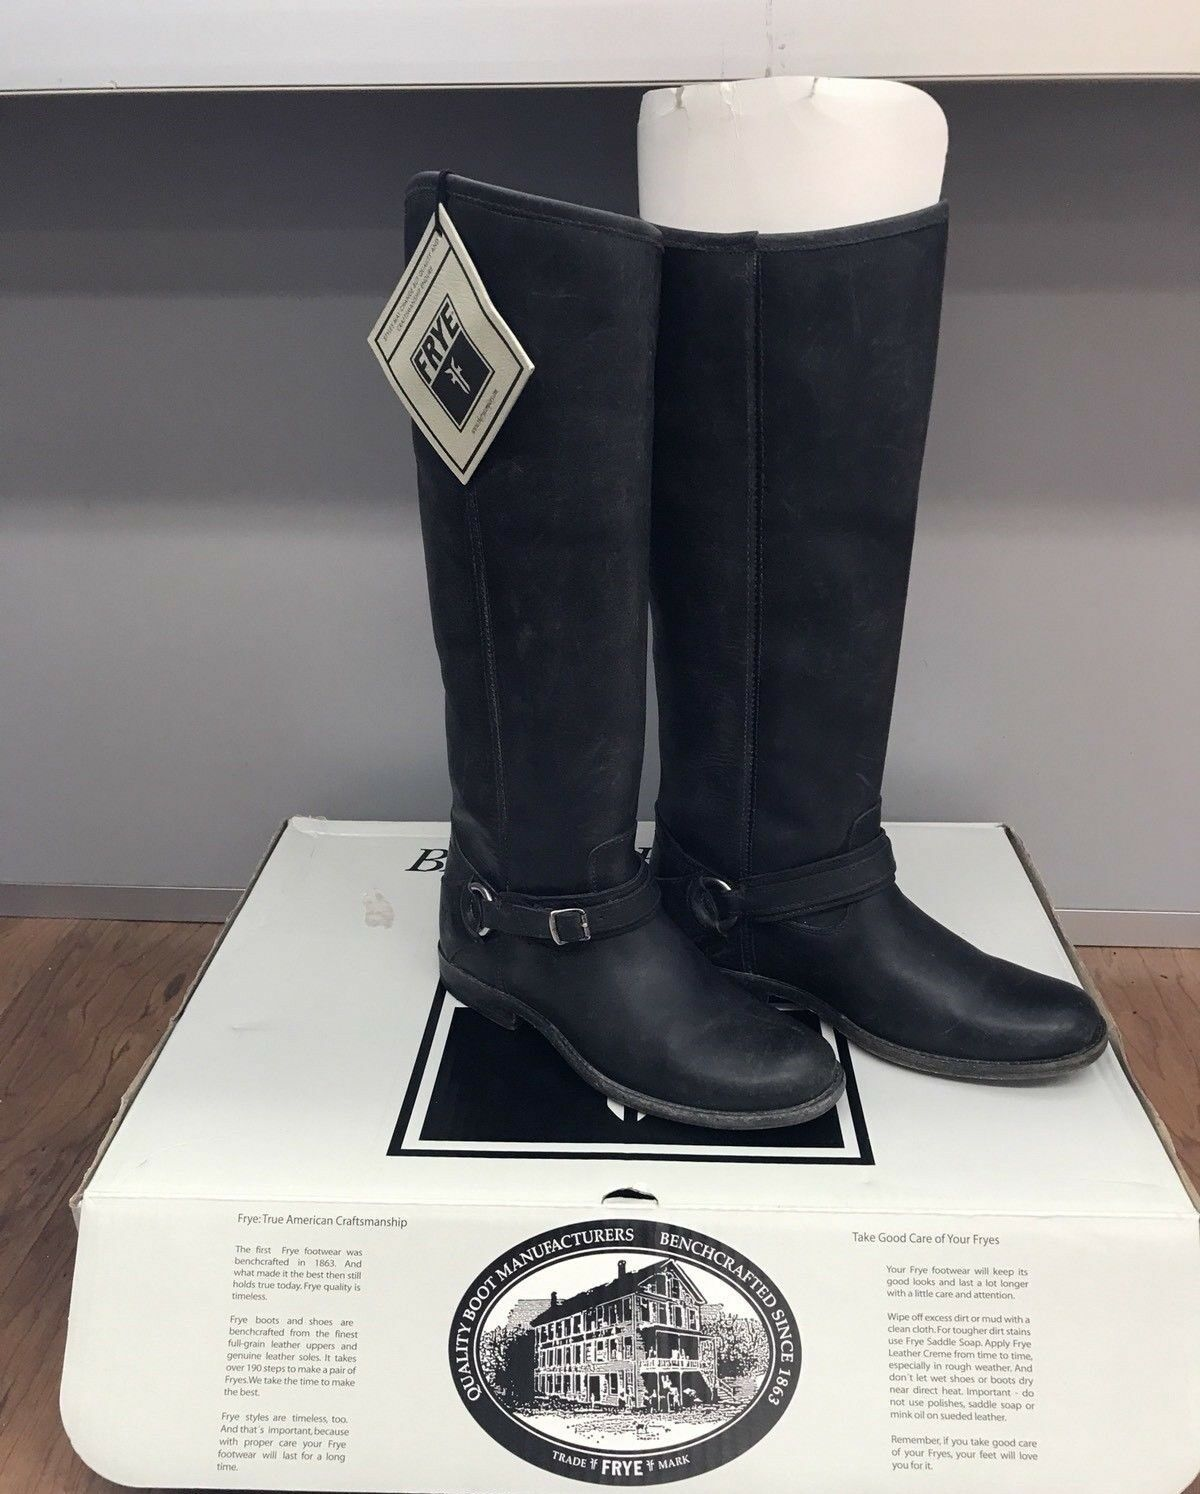 FRYE Women's Phillip Ring Tall Boot - Black Sz 8 $468